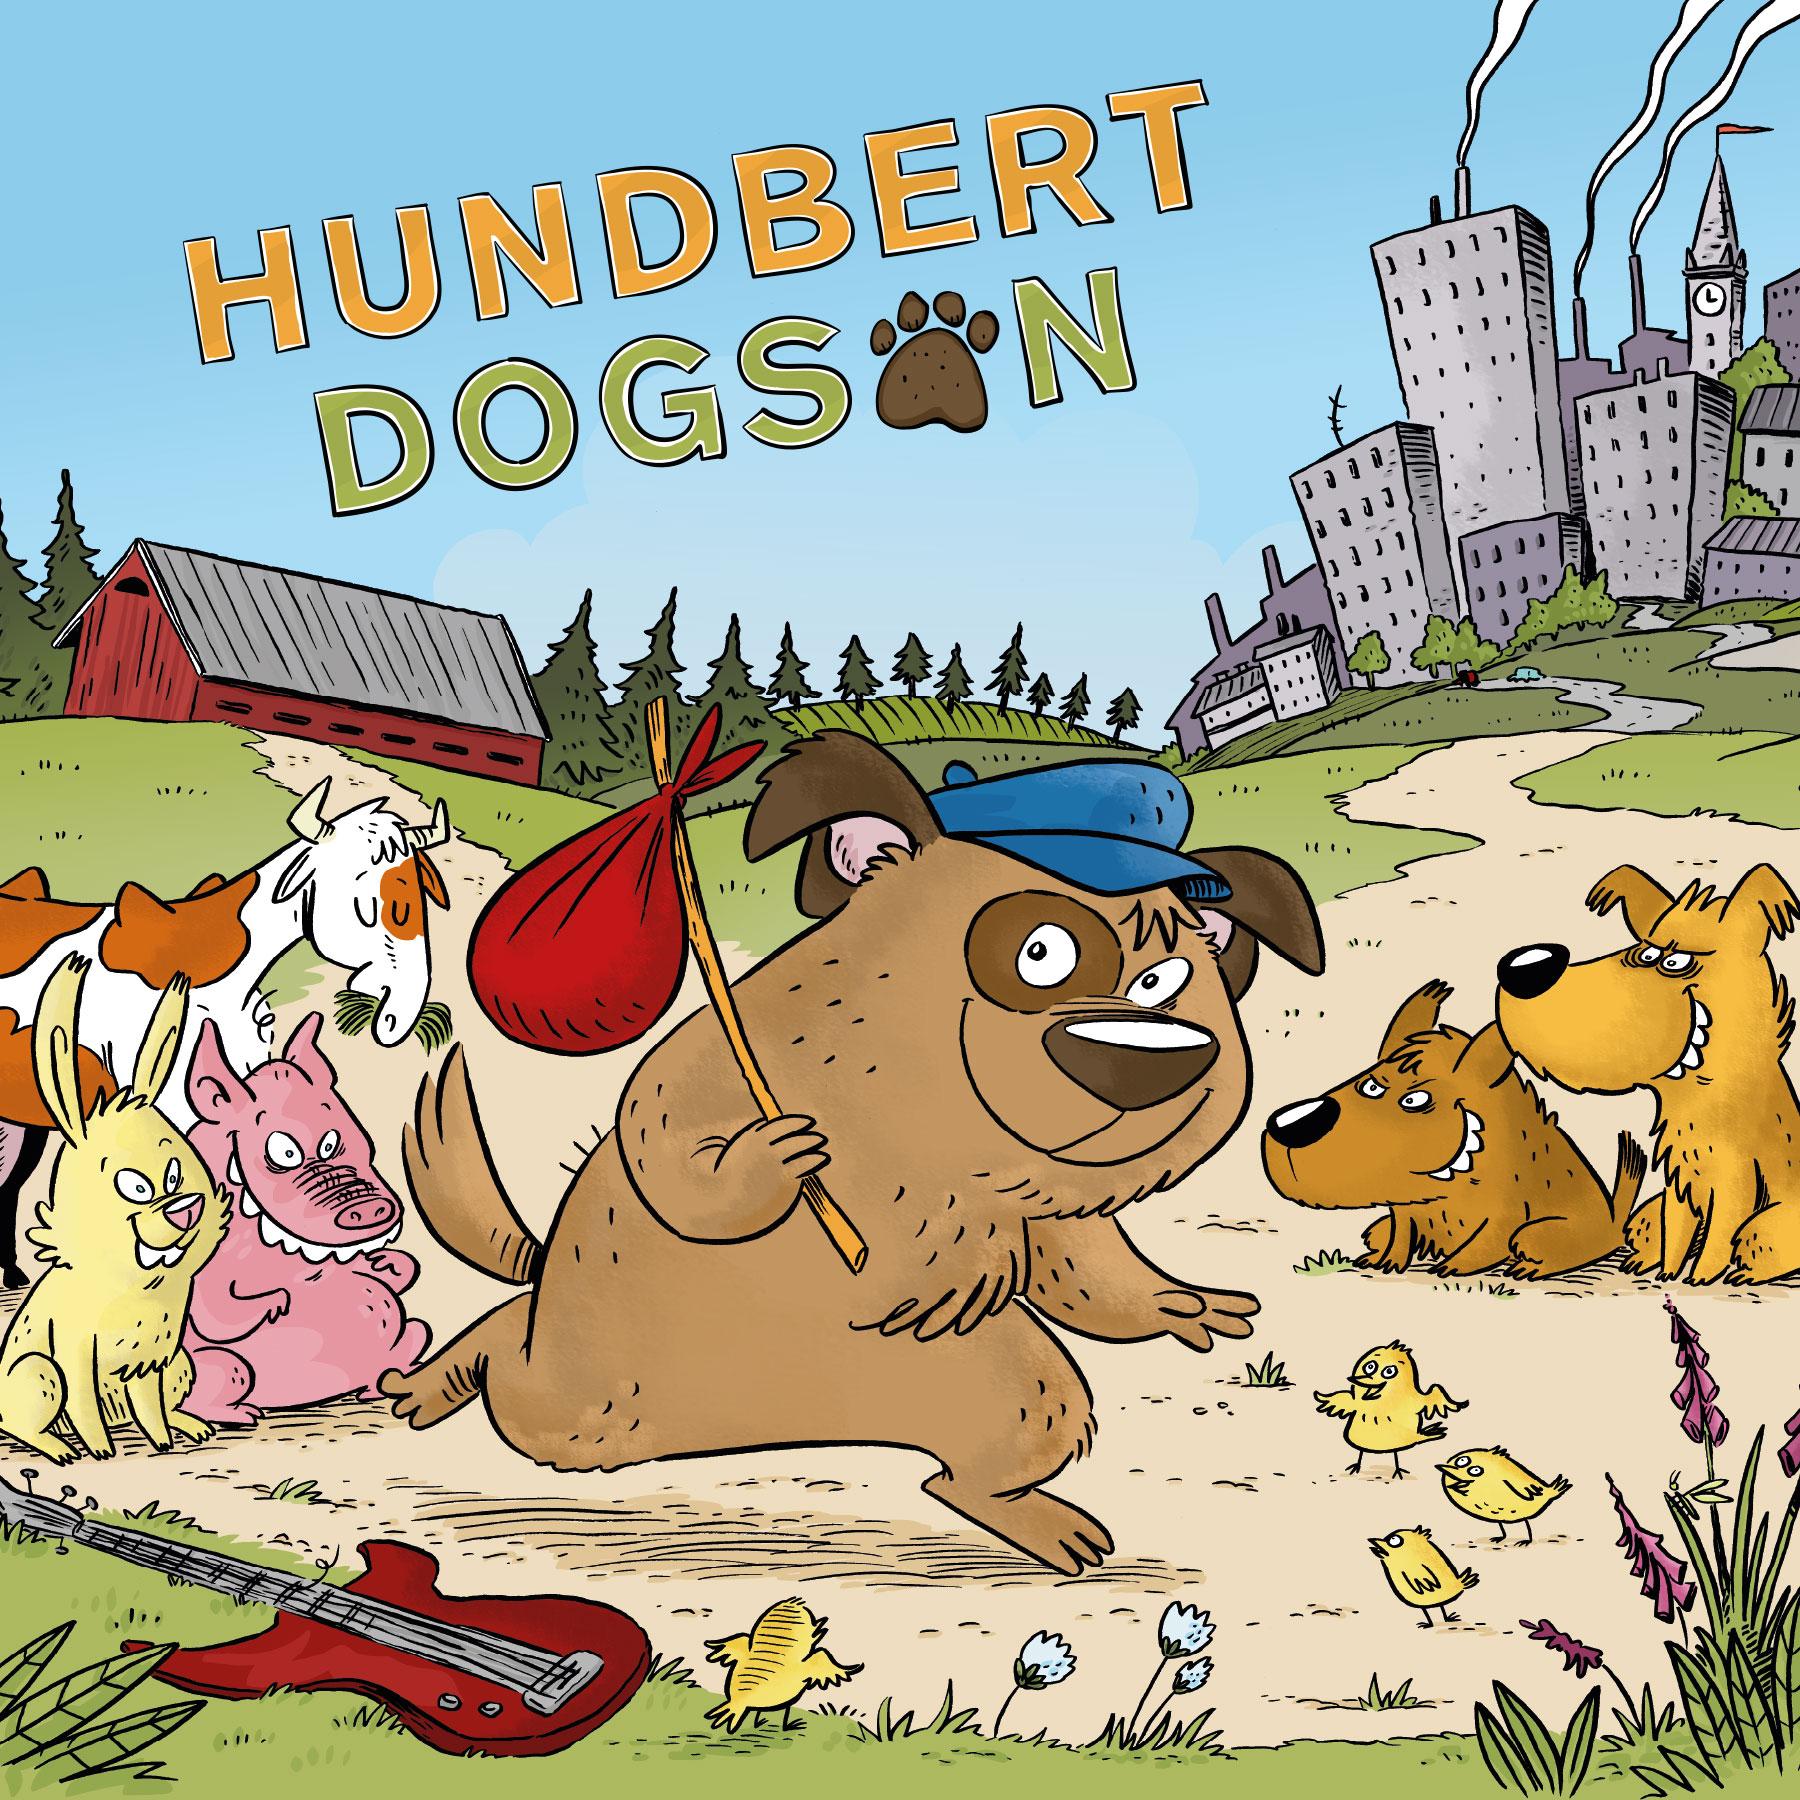 Hundbert Dogson